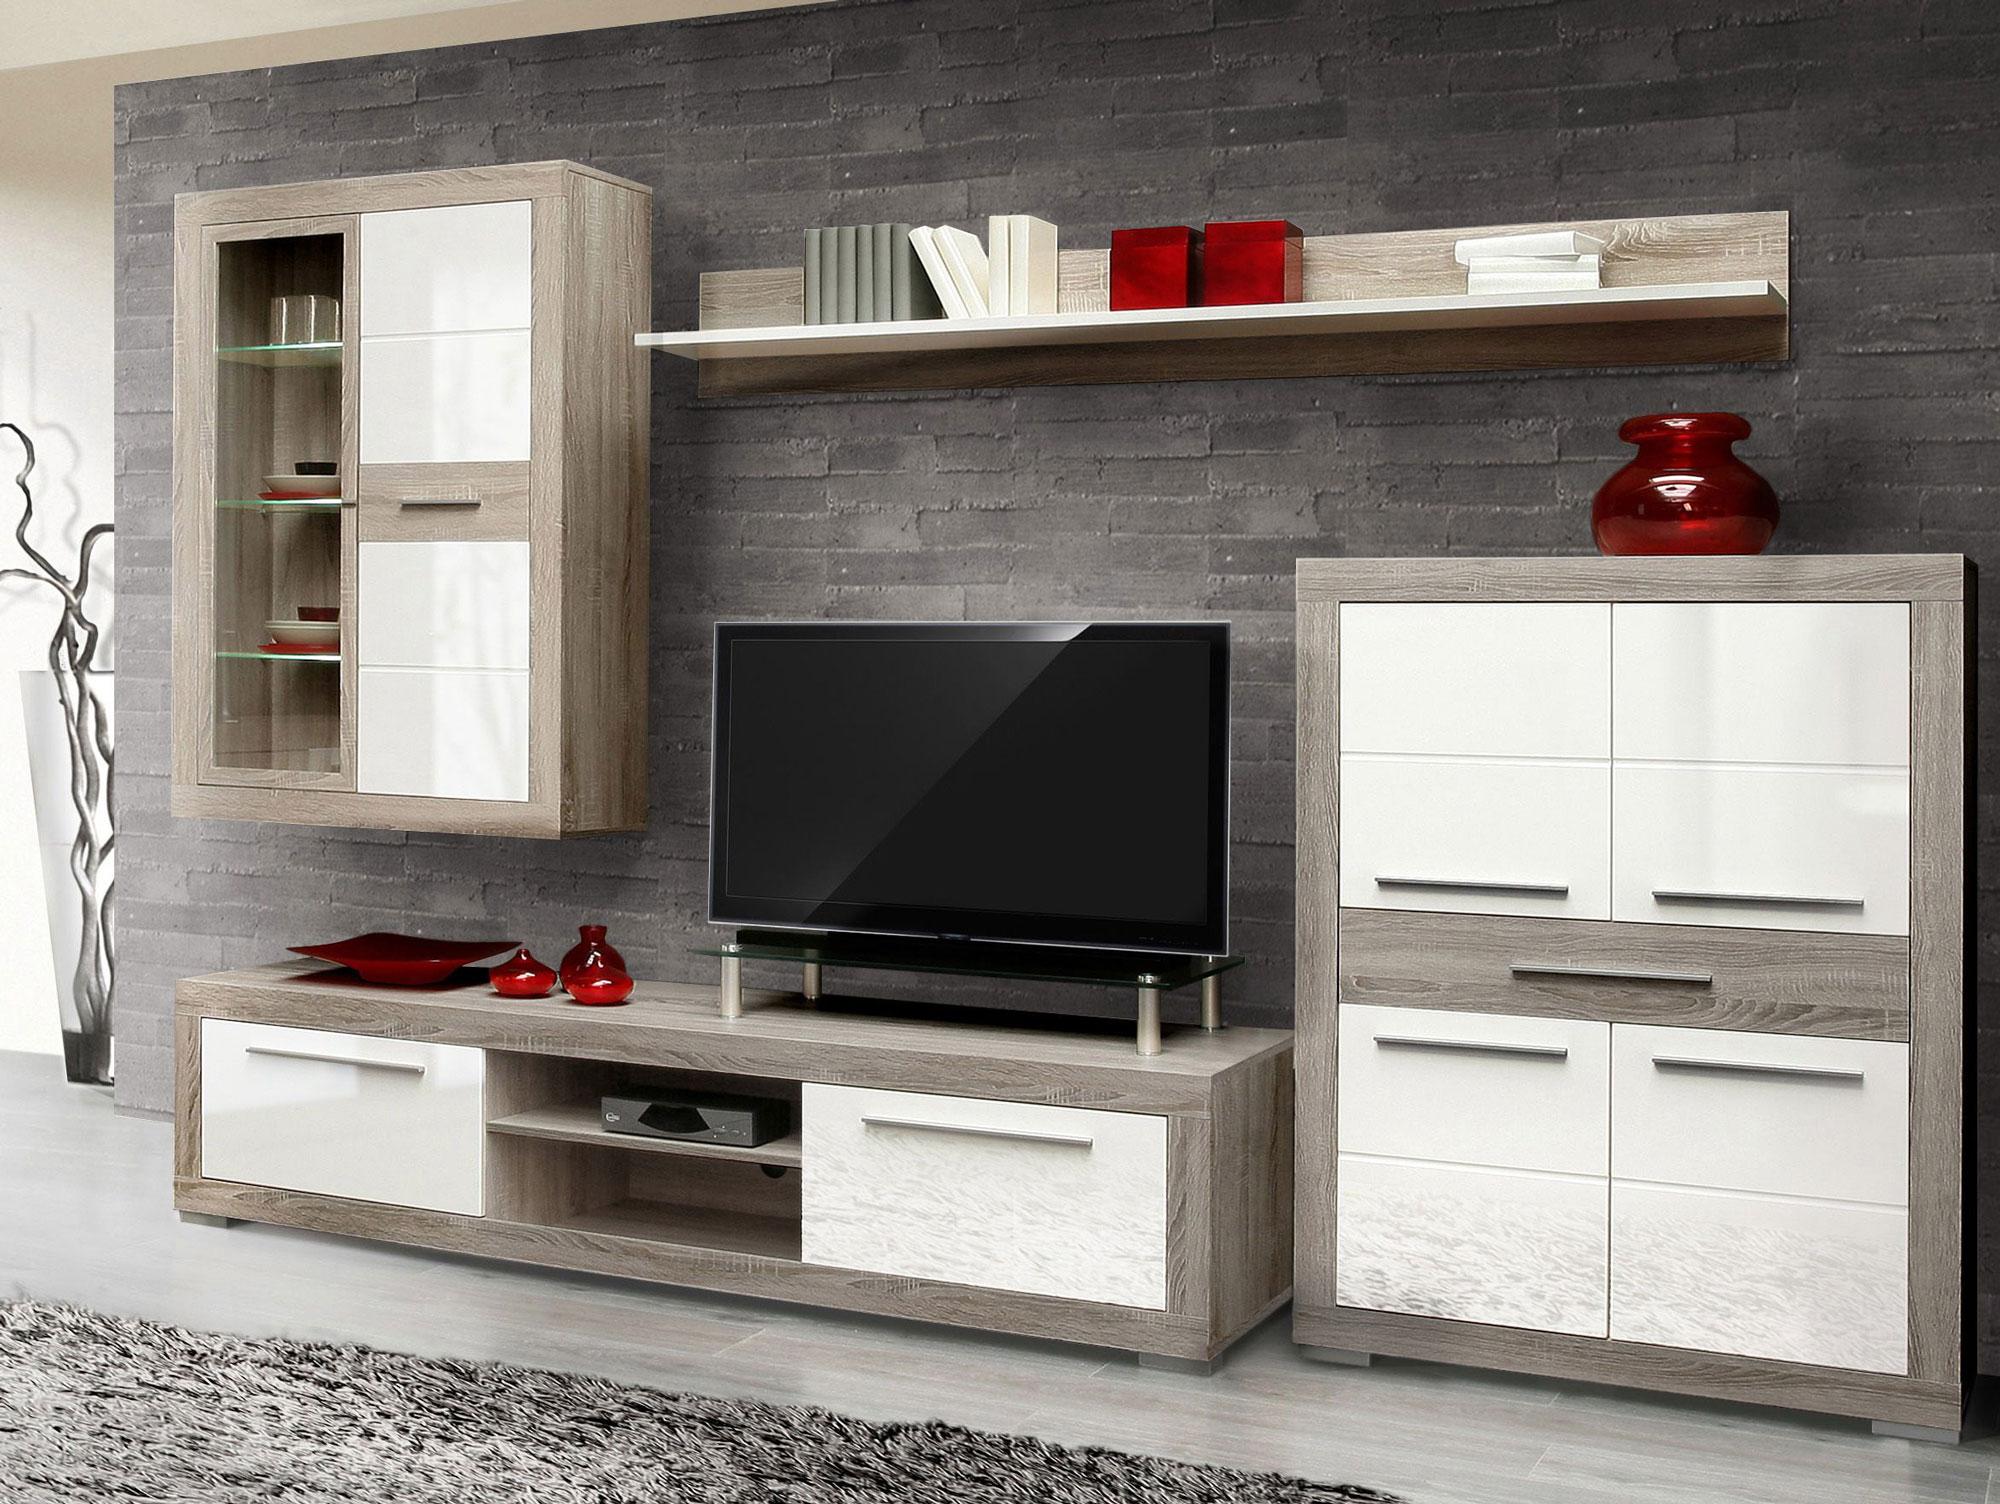 Emejing Wohnzimmer Eiche Grau Images